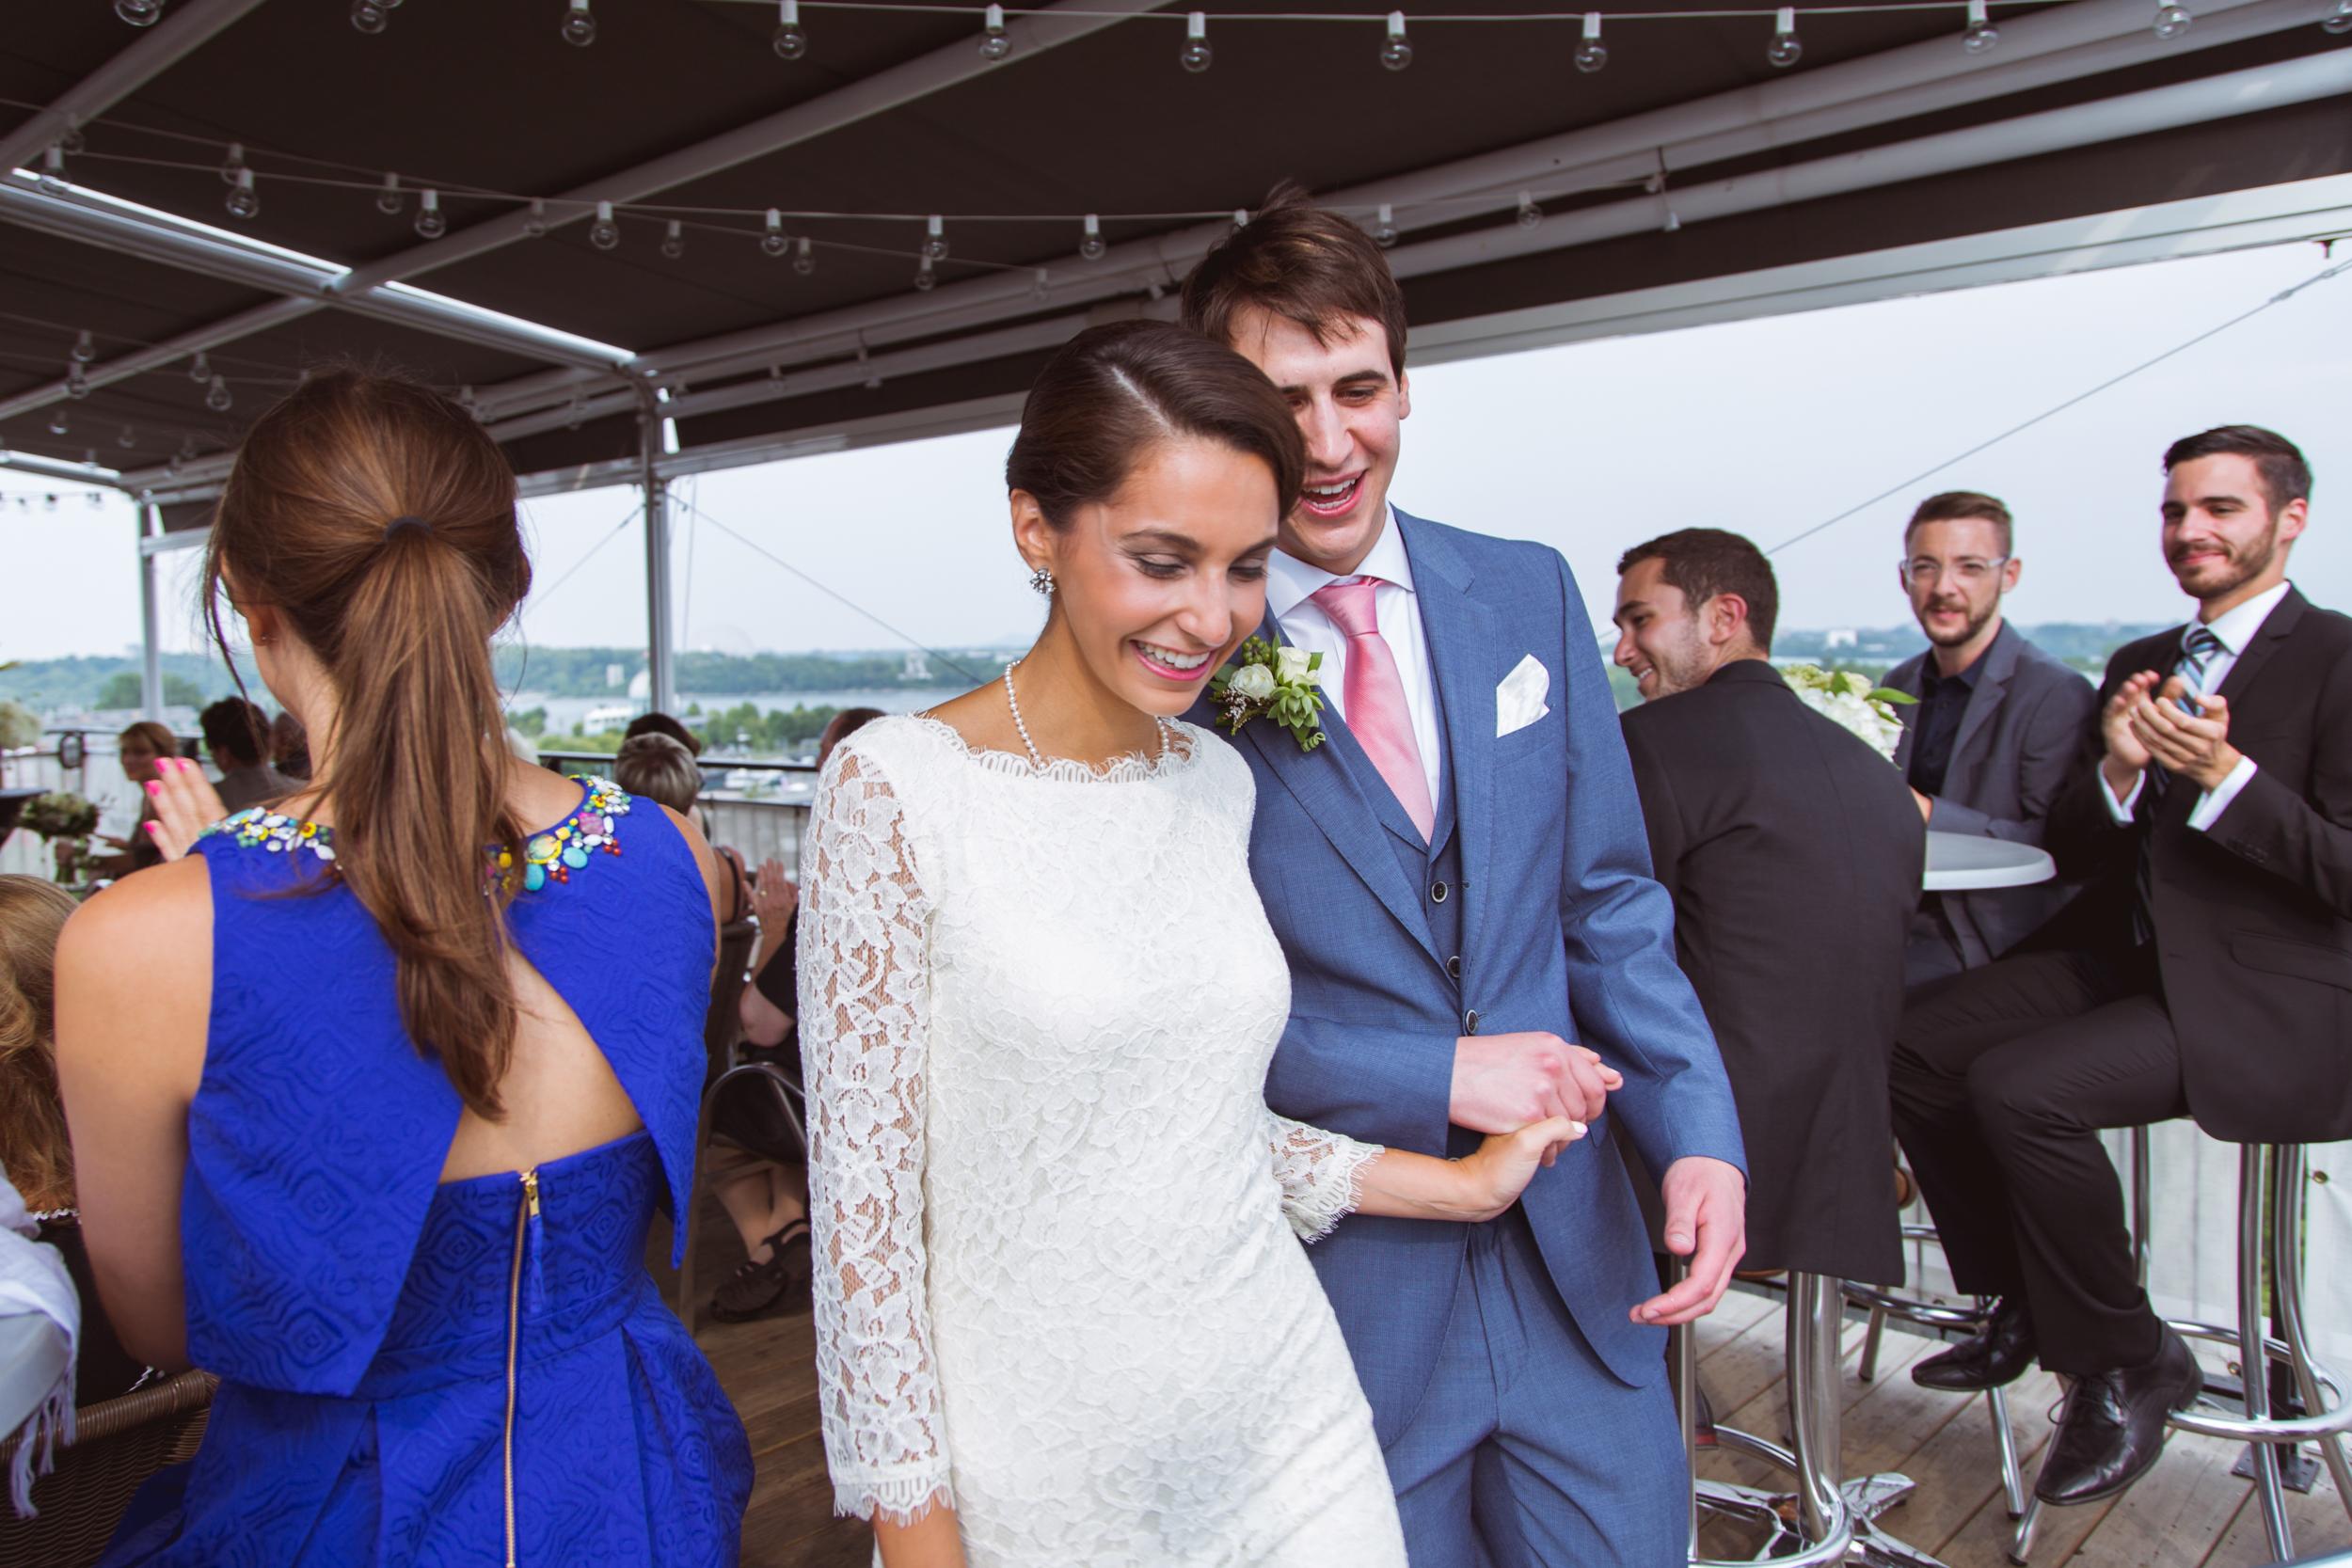 Wedding (17 of 17).JPG